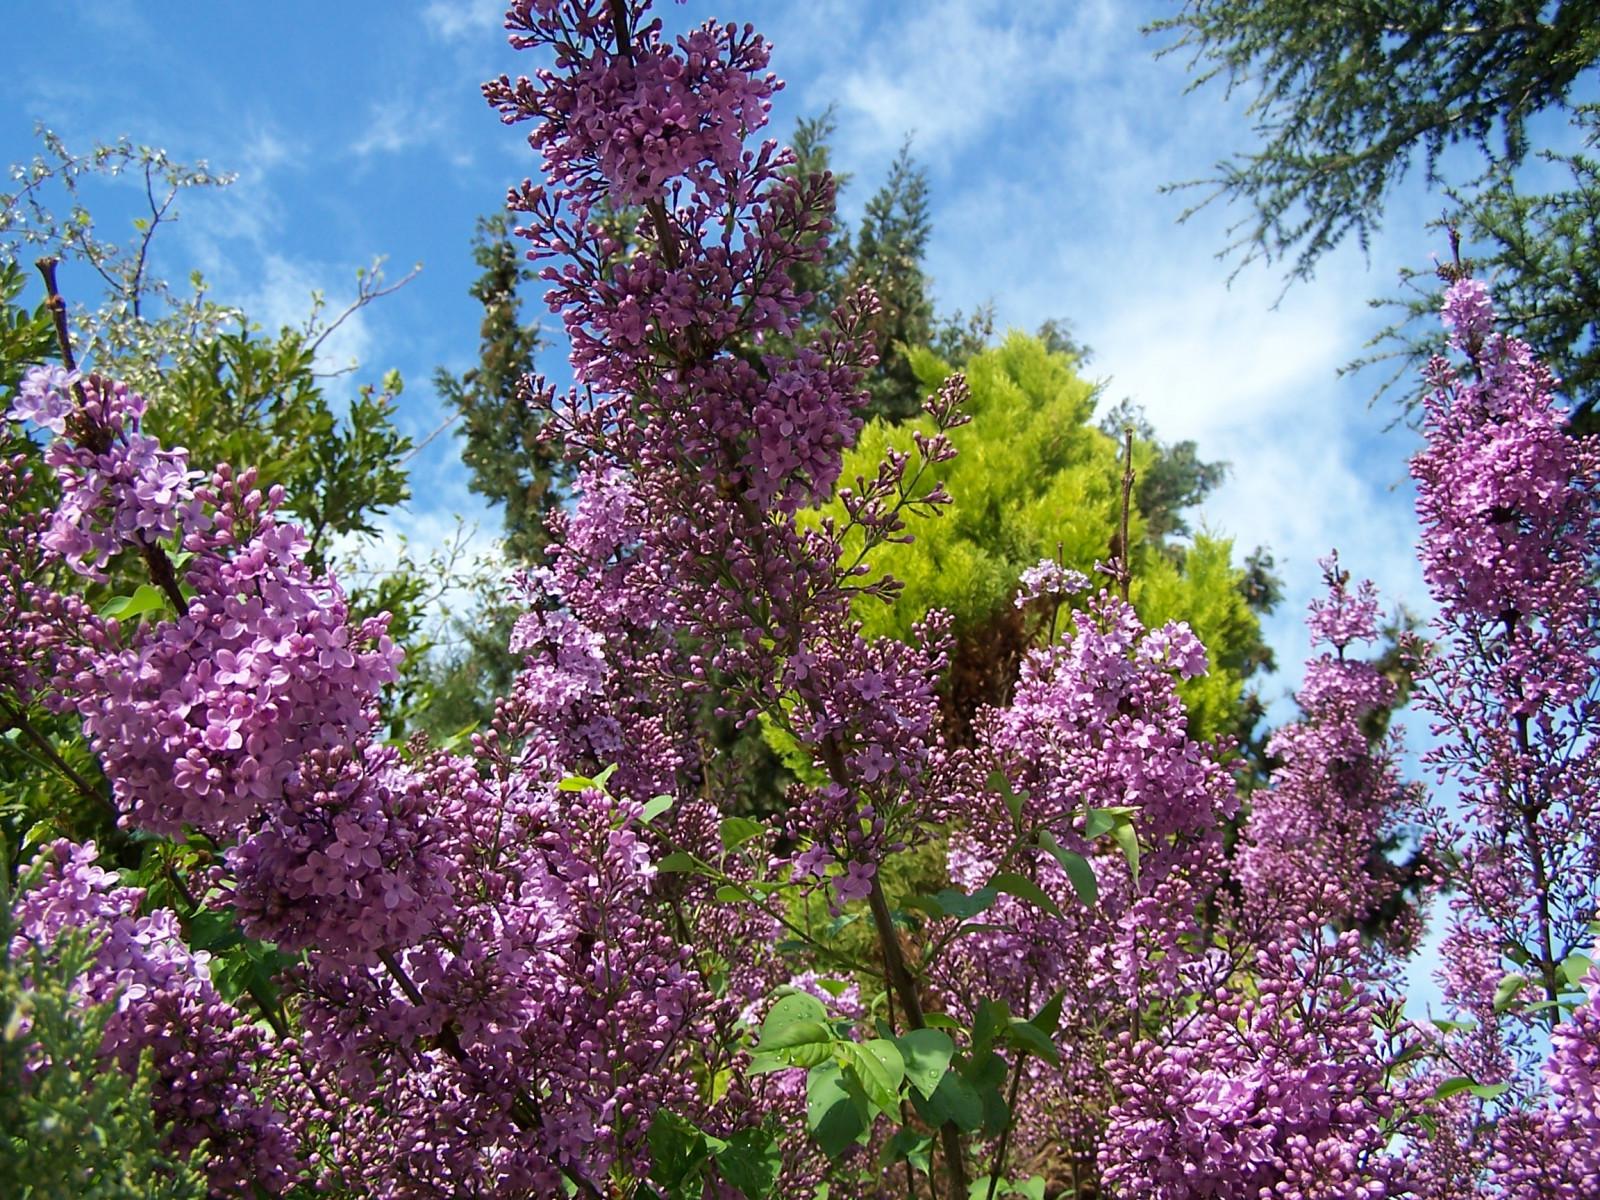 hintergrundbilder b ume blumen natur himmel pflanzen lila bl ht fichte griechenland